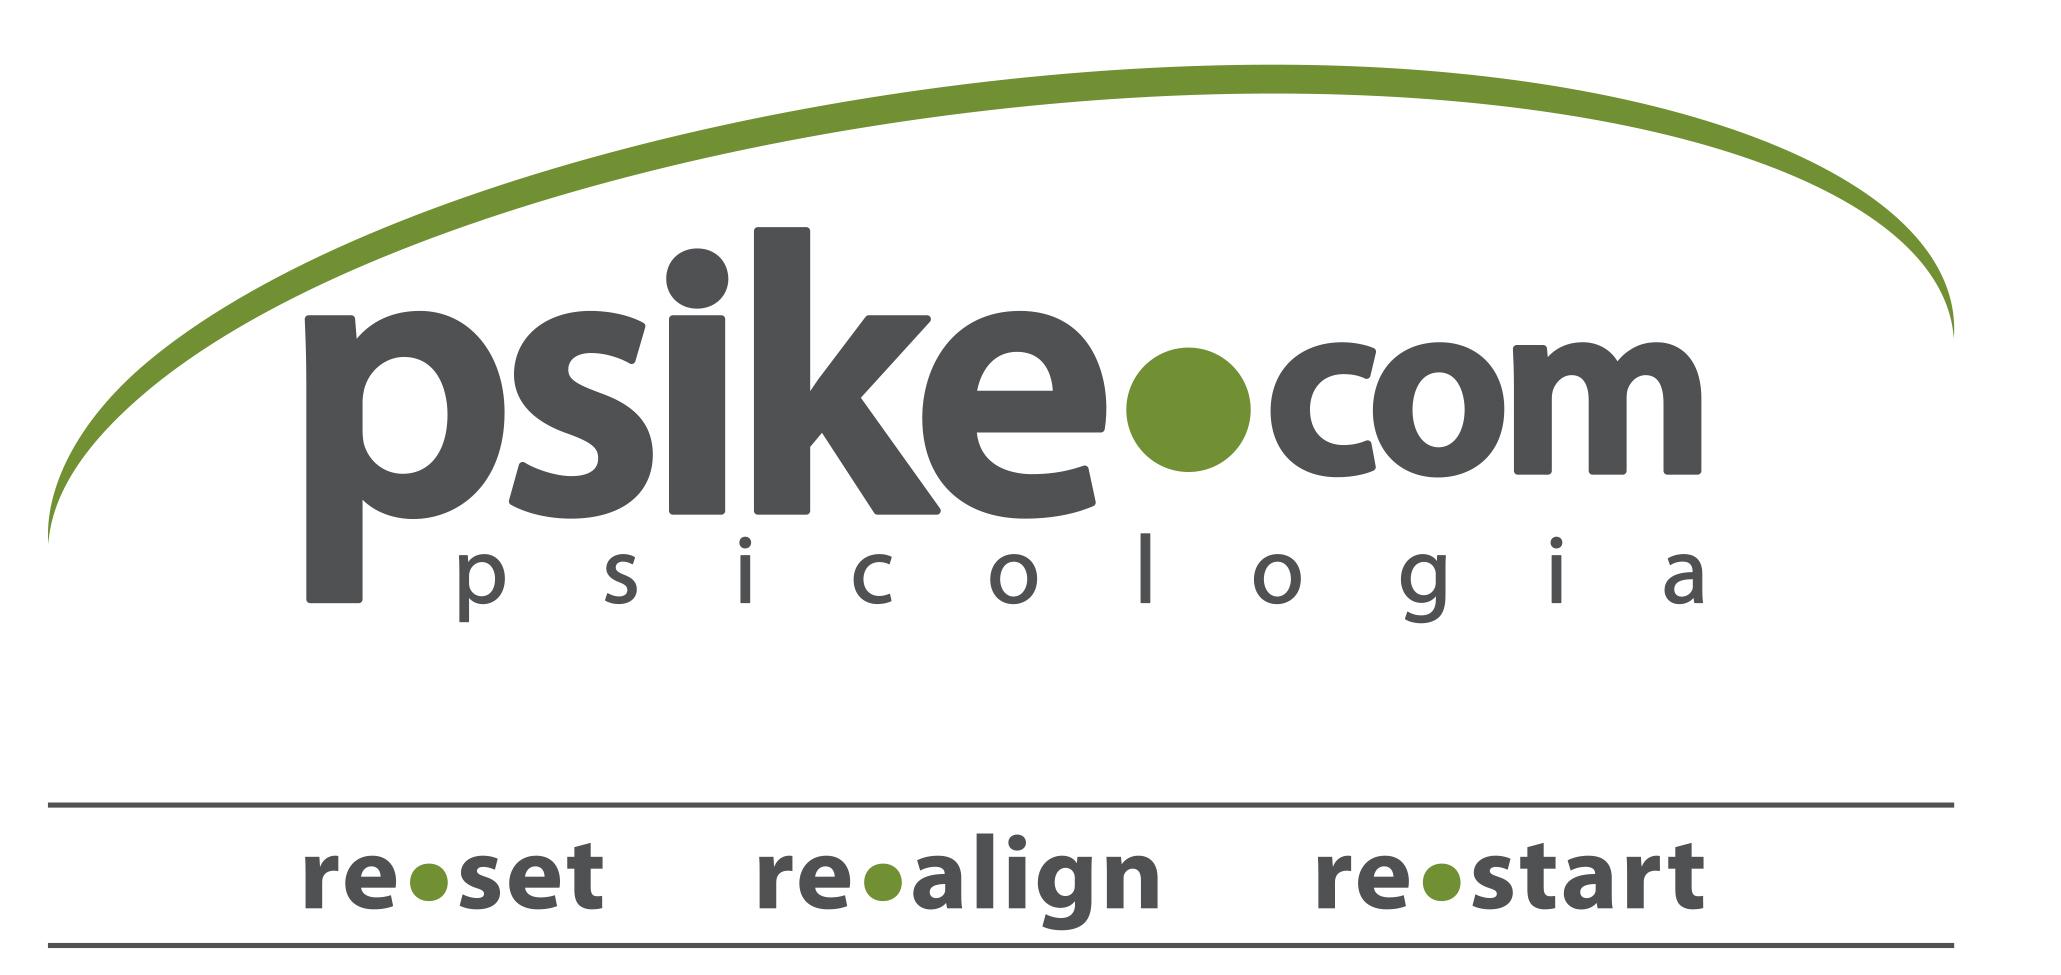 psike.com